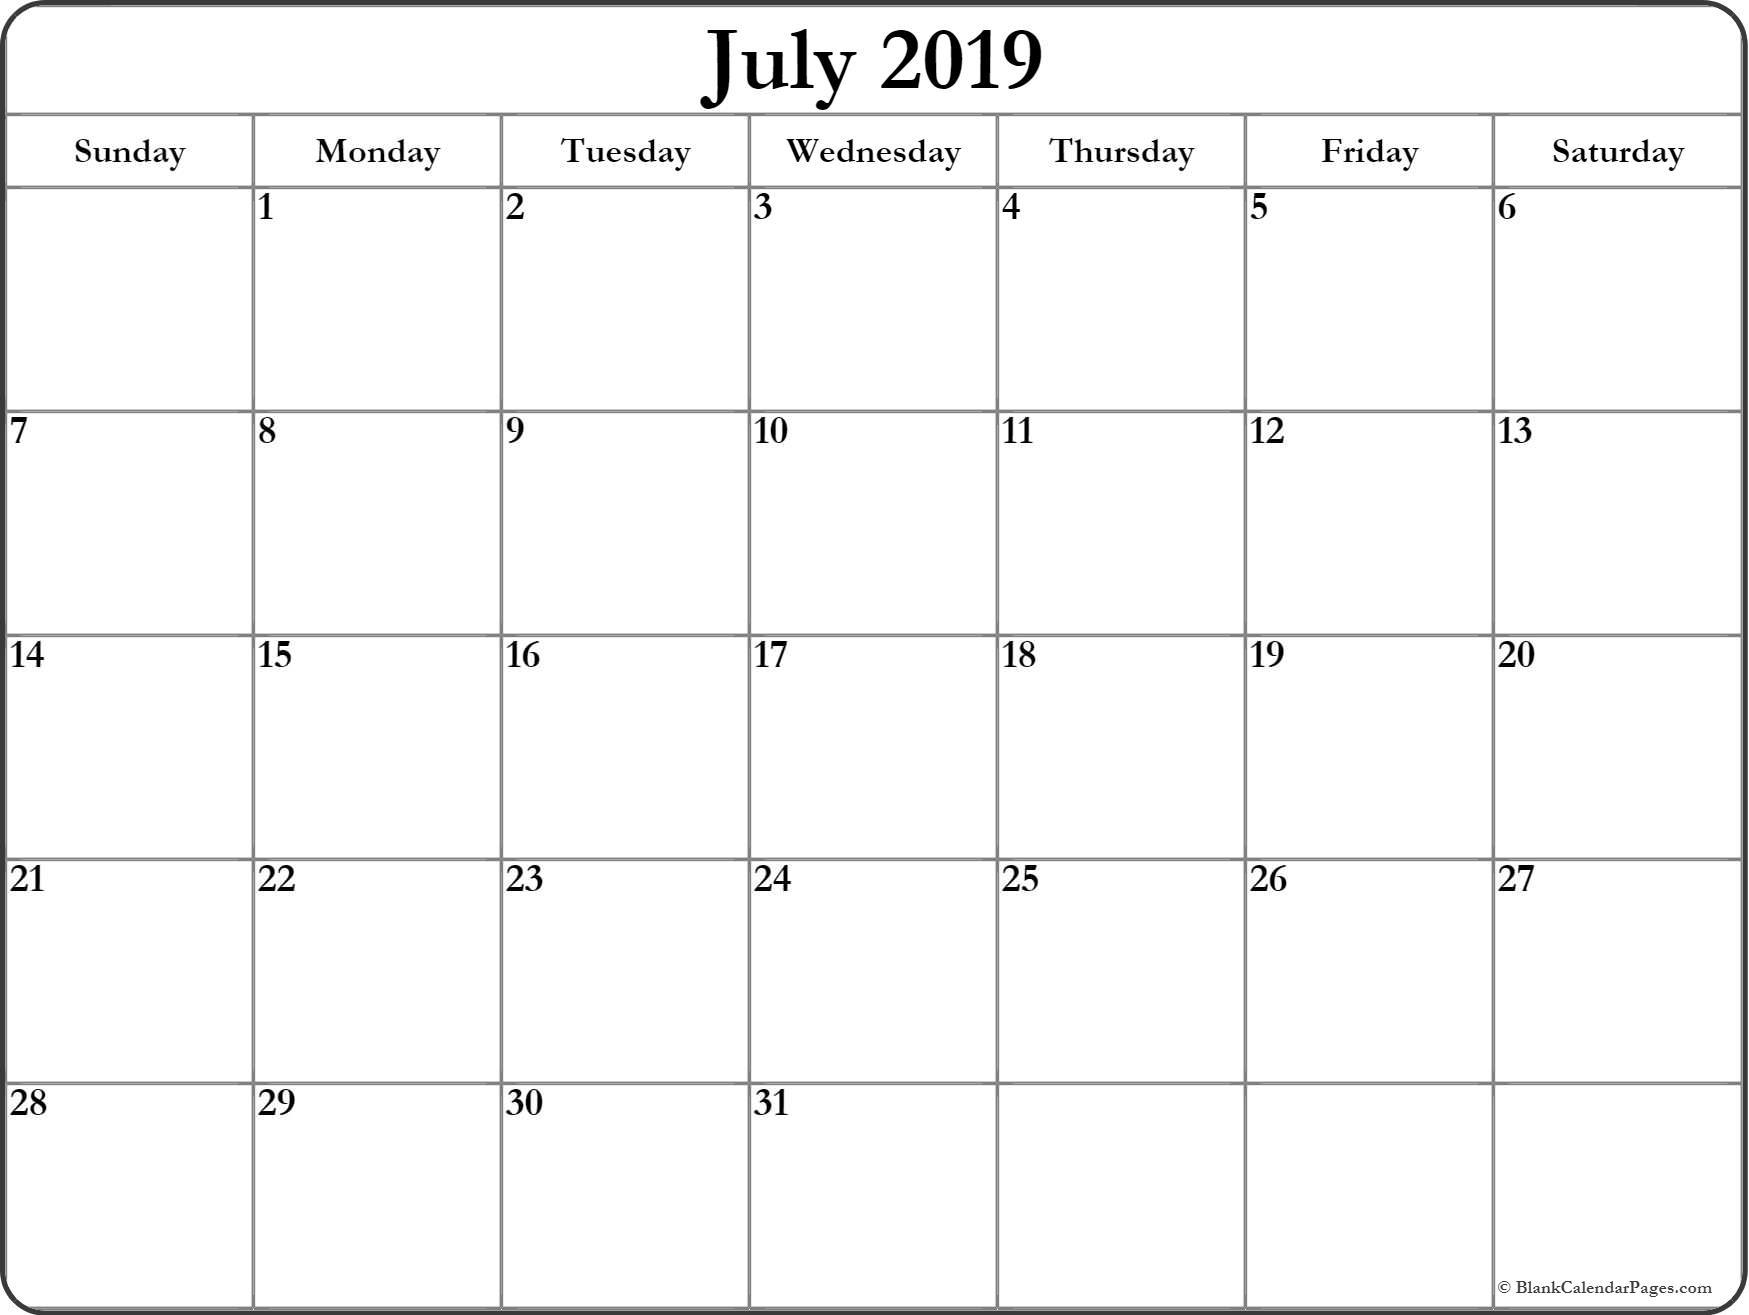 July 2019 Calendar | Free Printable Monthly Calendars pertaining to Blank July Calendar Printable